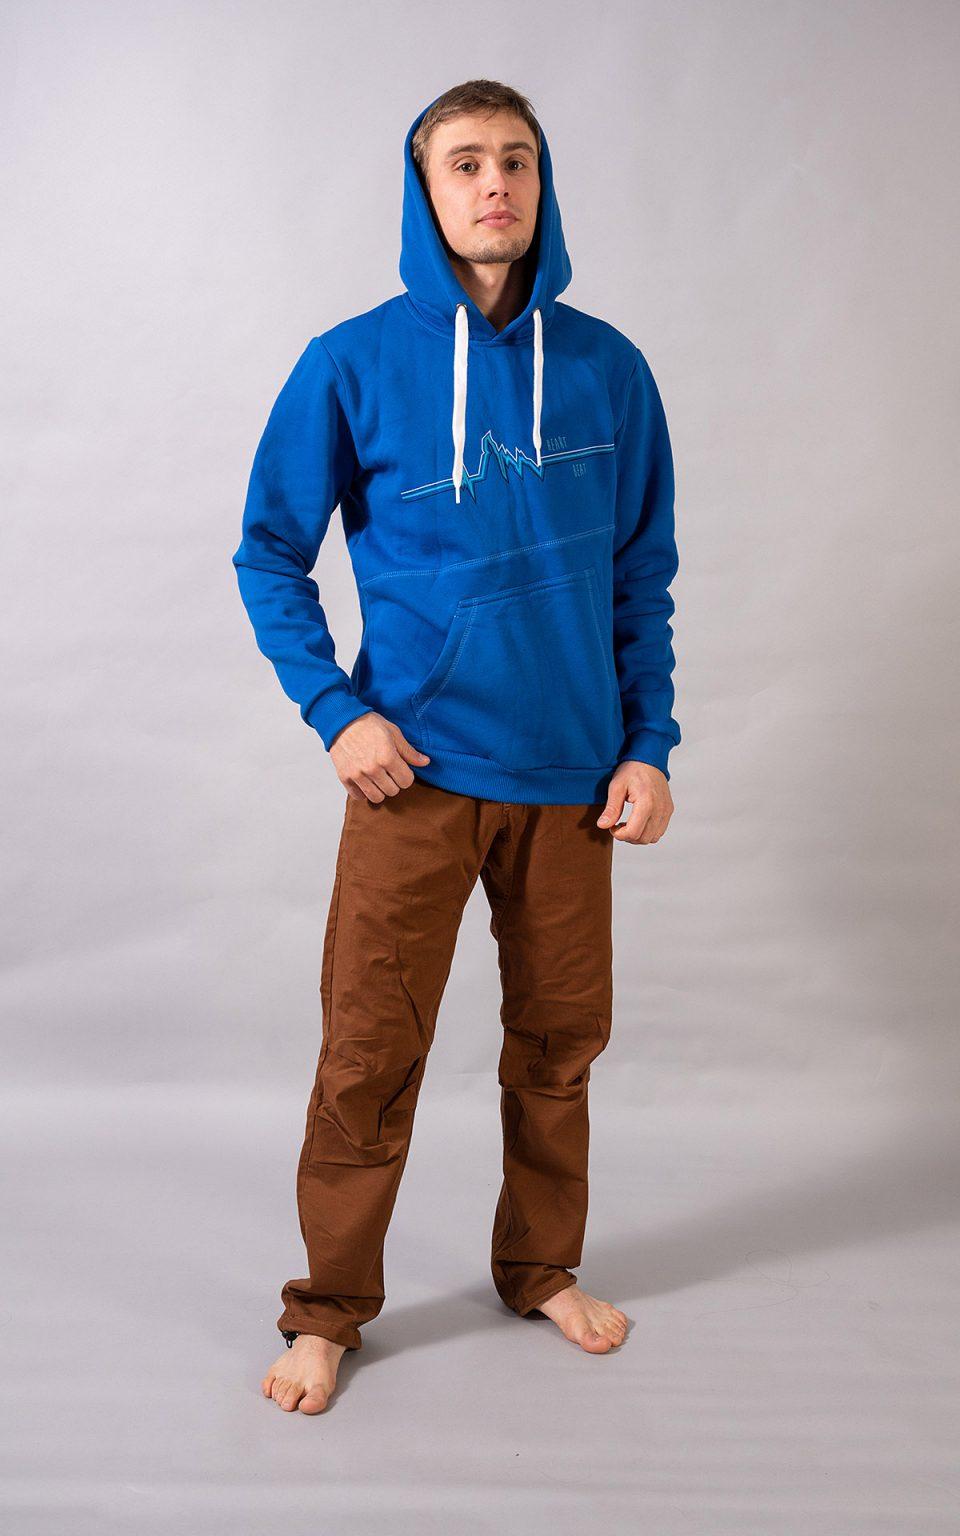 Bluza męska Cerro Torre - niebieska